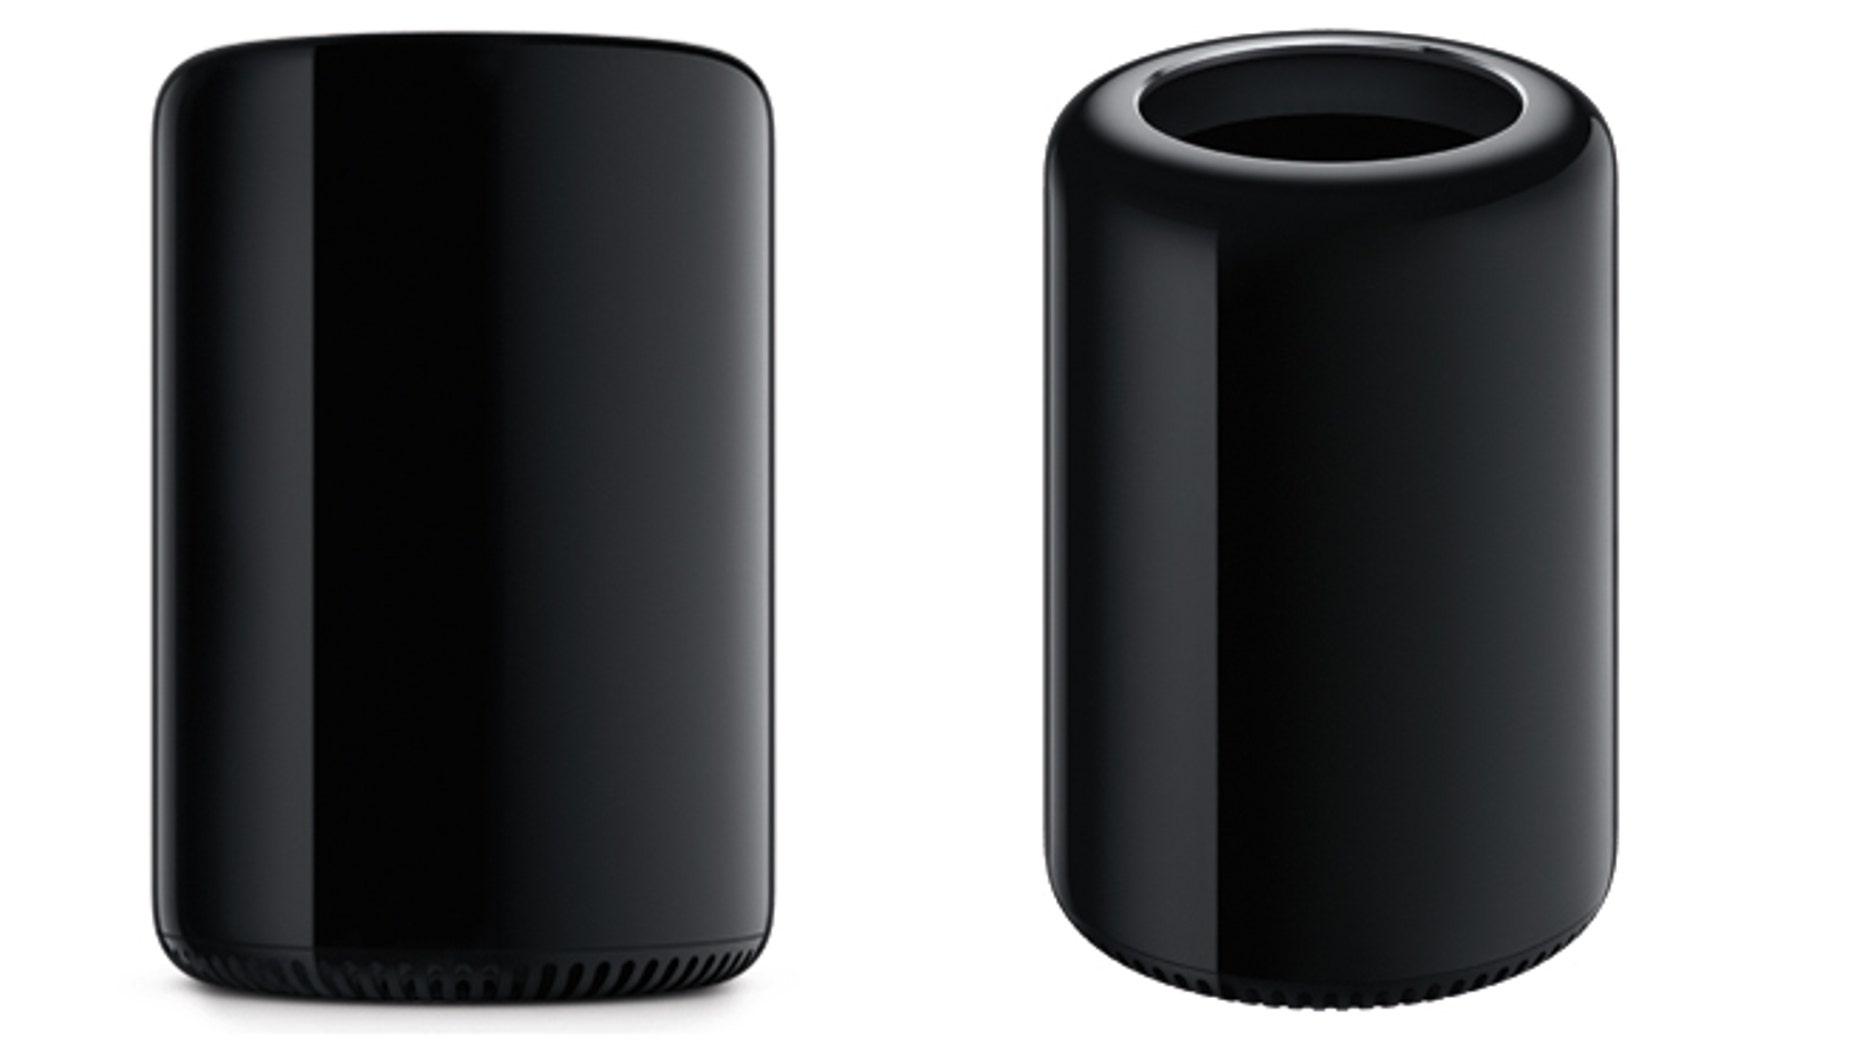 A sneak peek into the future of the Apple Pro desktop -- next generation Mac Pro.